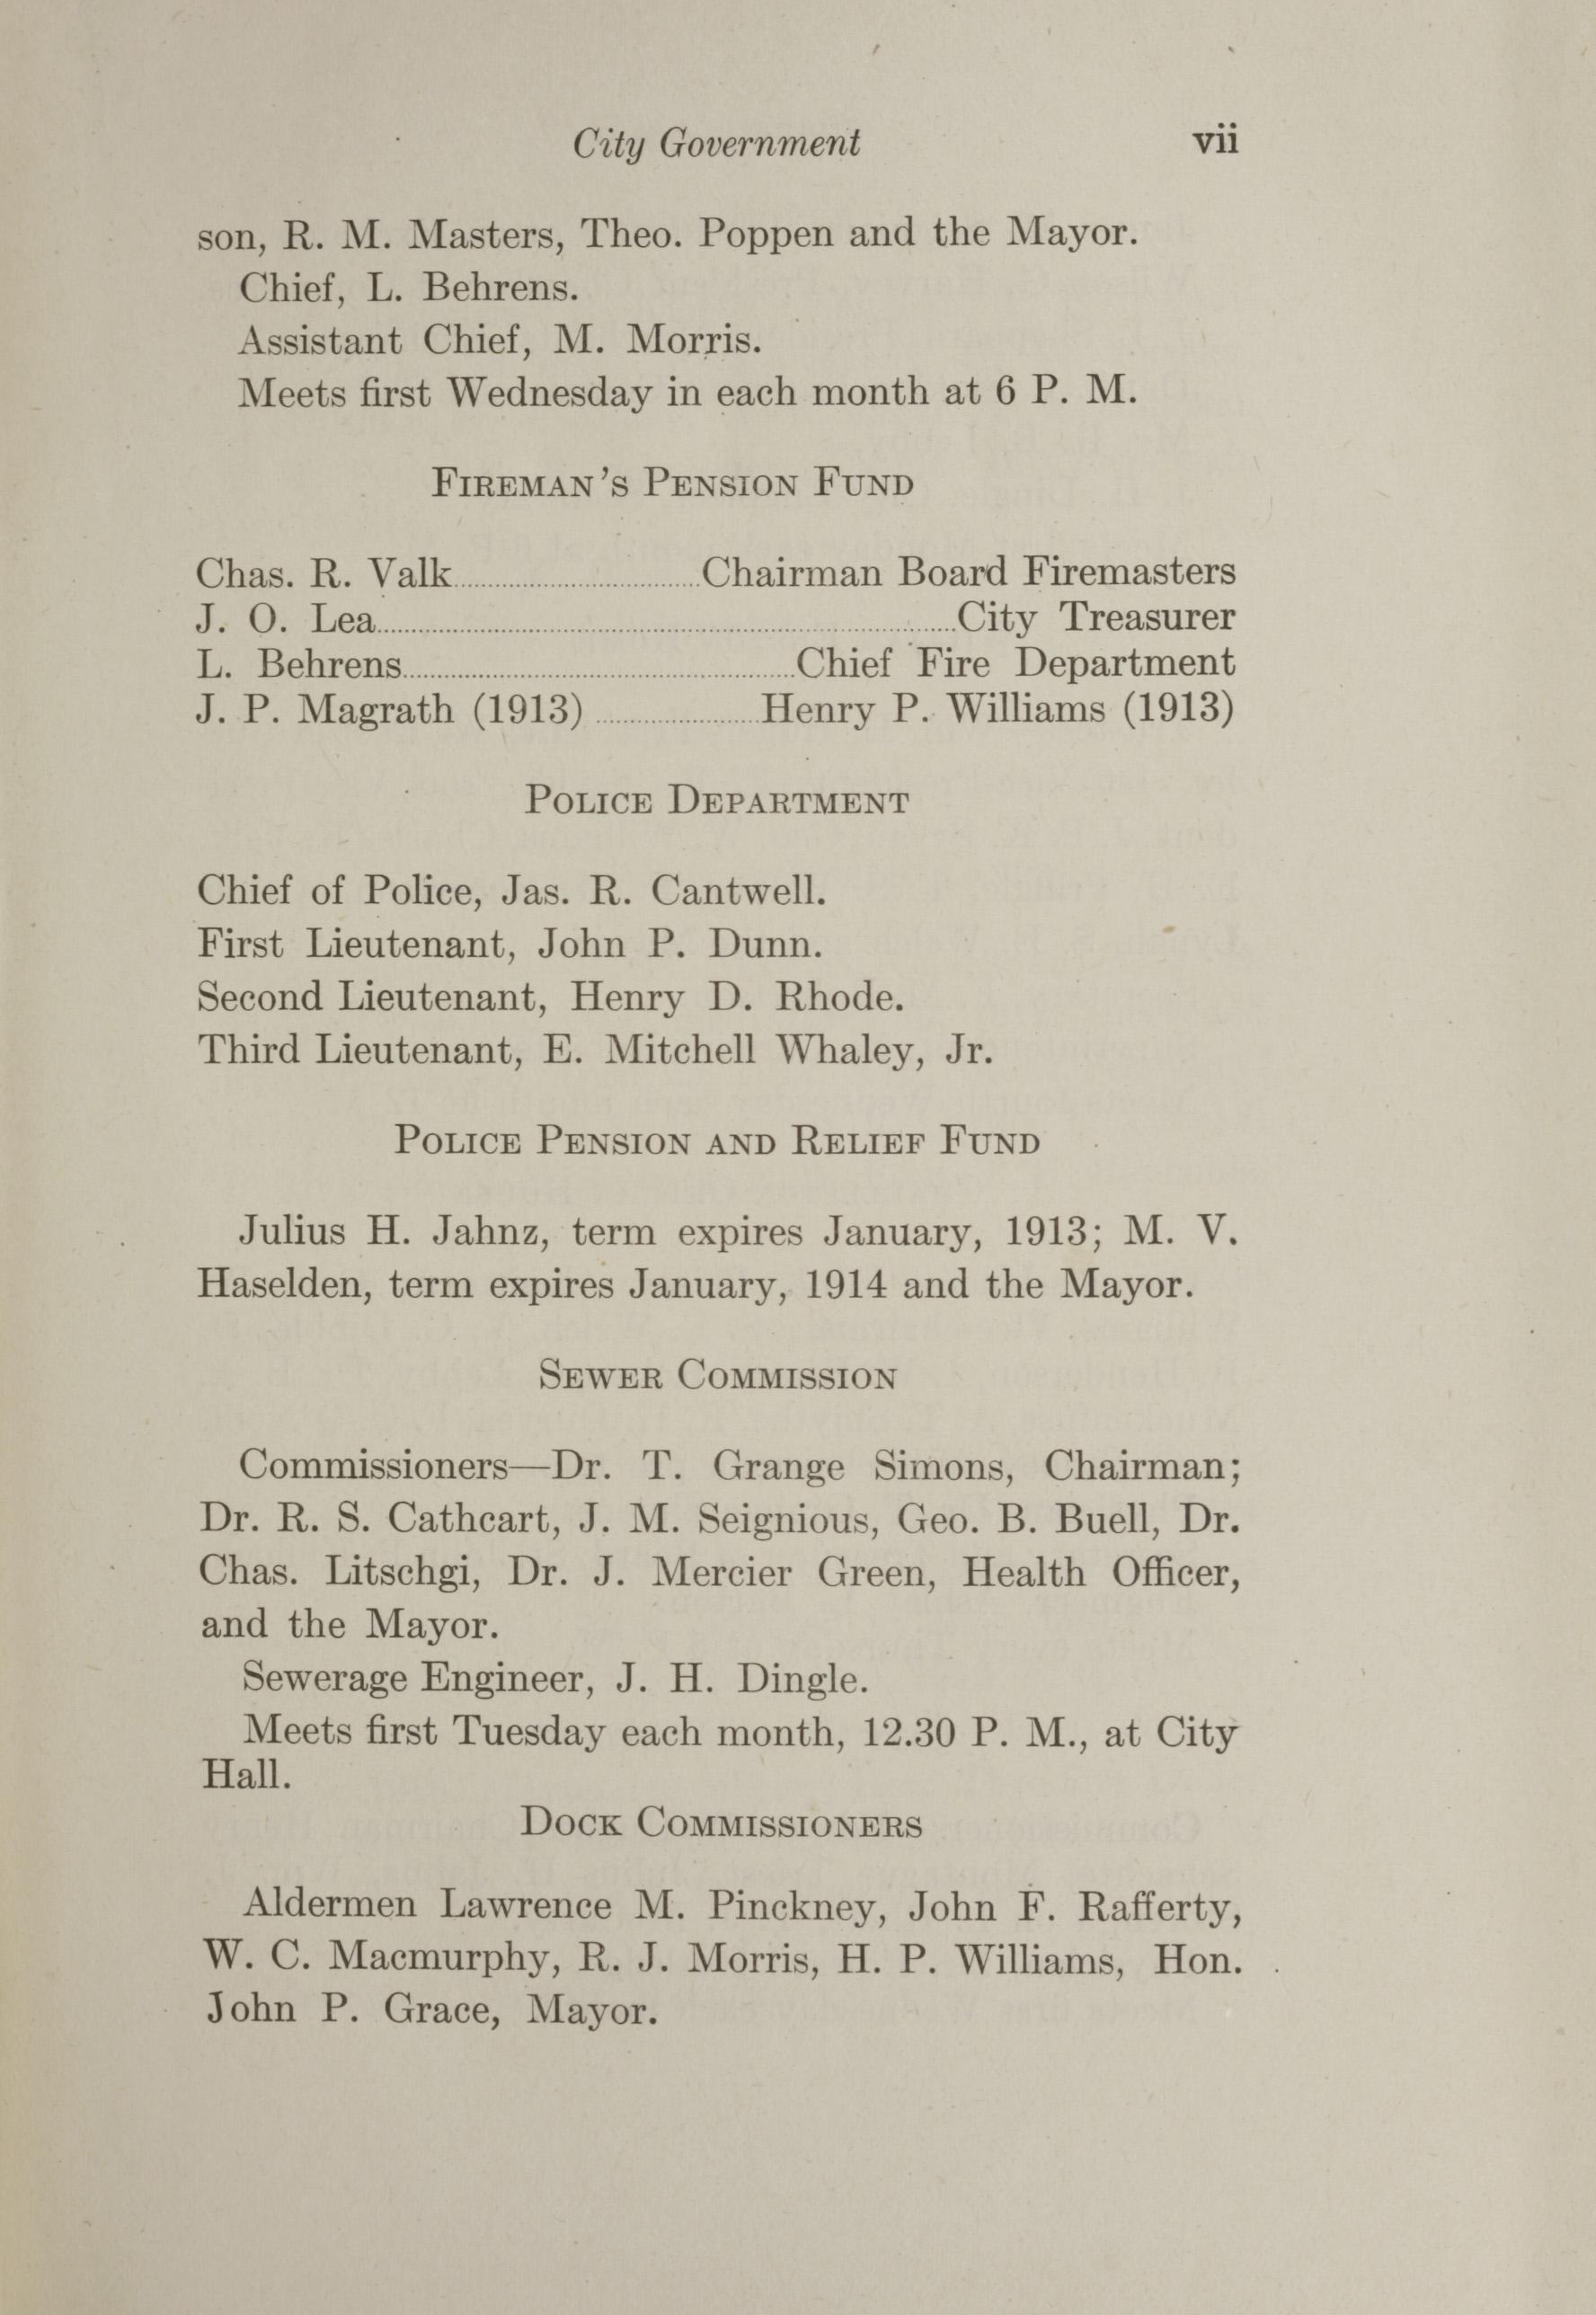 Charleston Yearbook, 1912, page vii